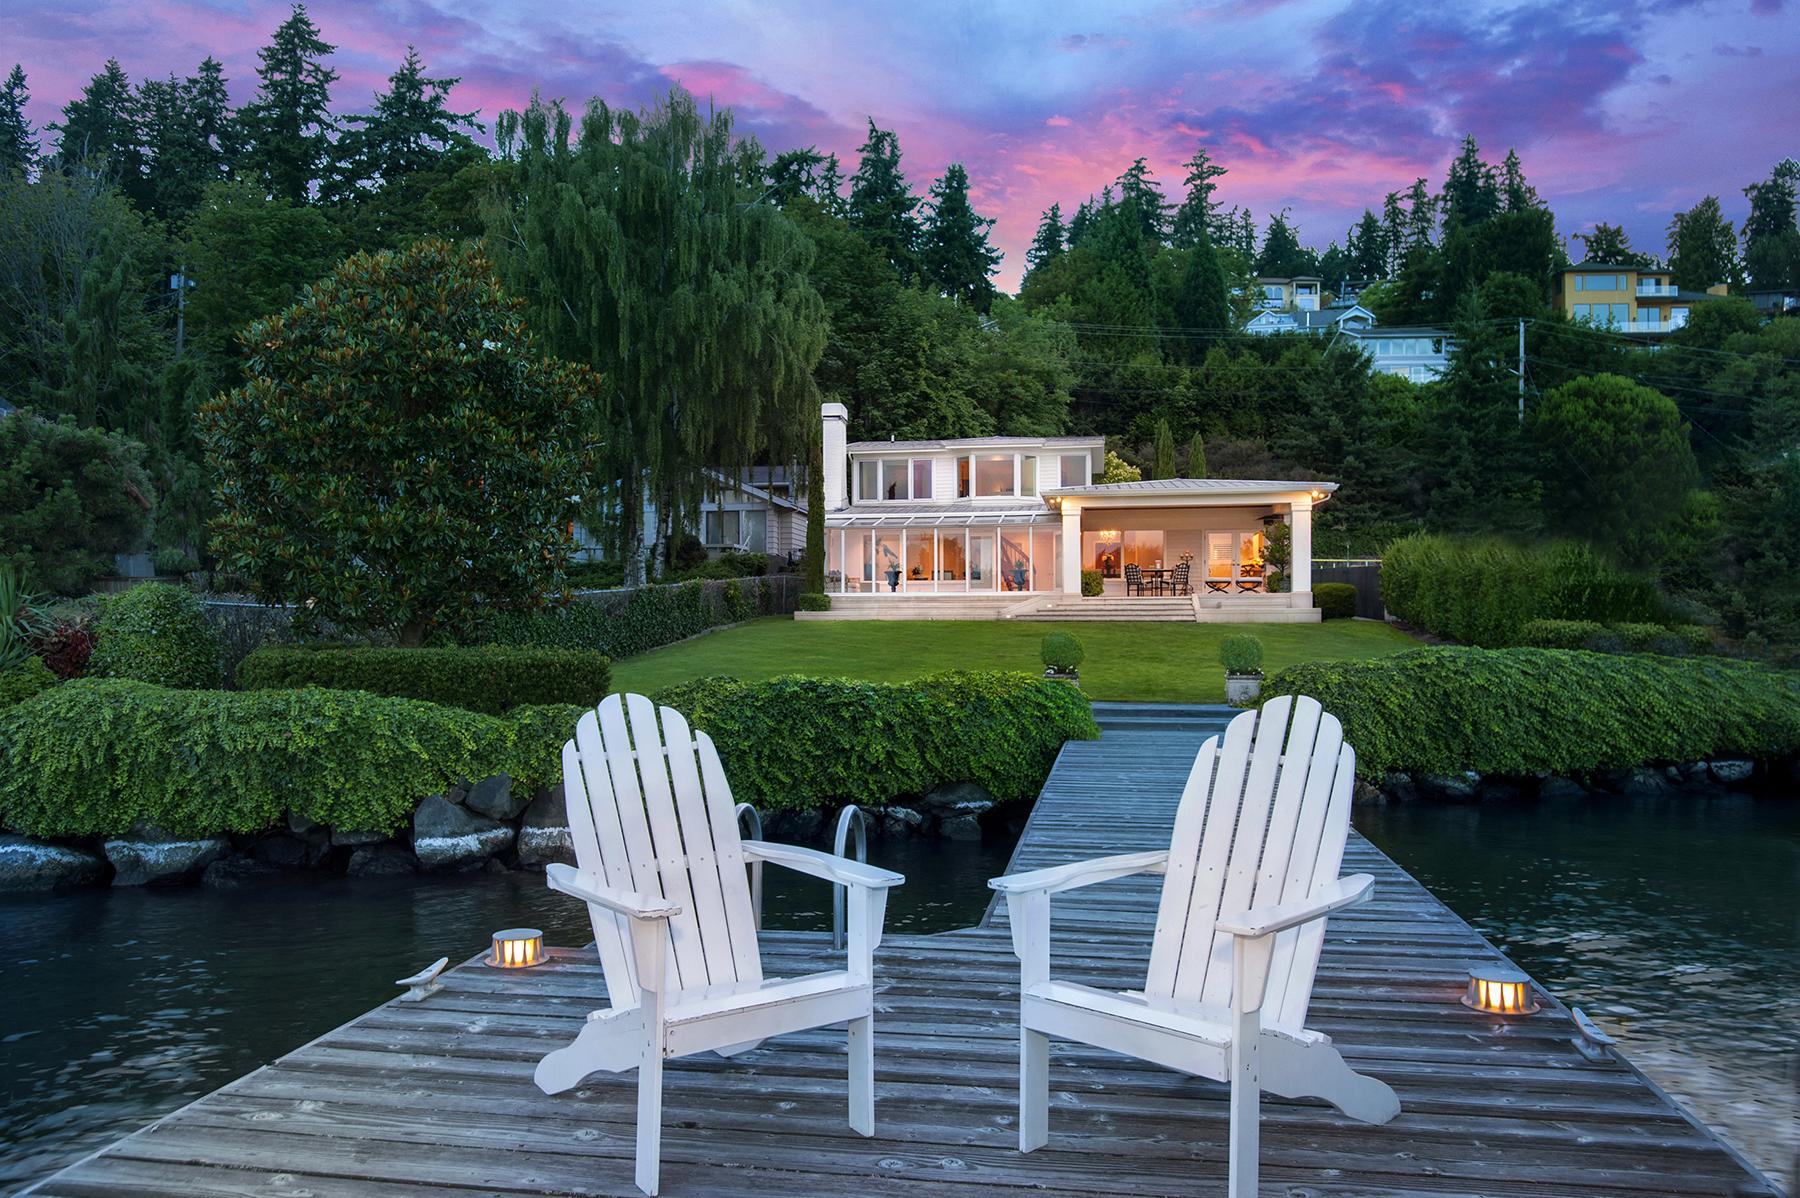 Single Family Home for Sale at Juanita 8851 NE Juanita Lane Kirkland, Washington 98034 United States